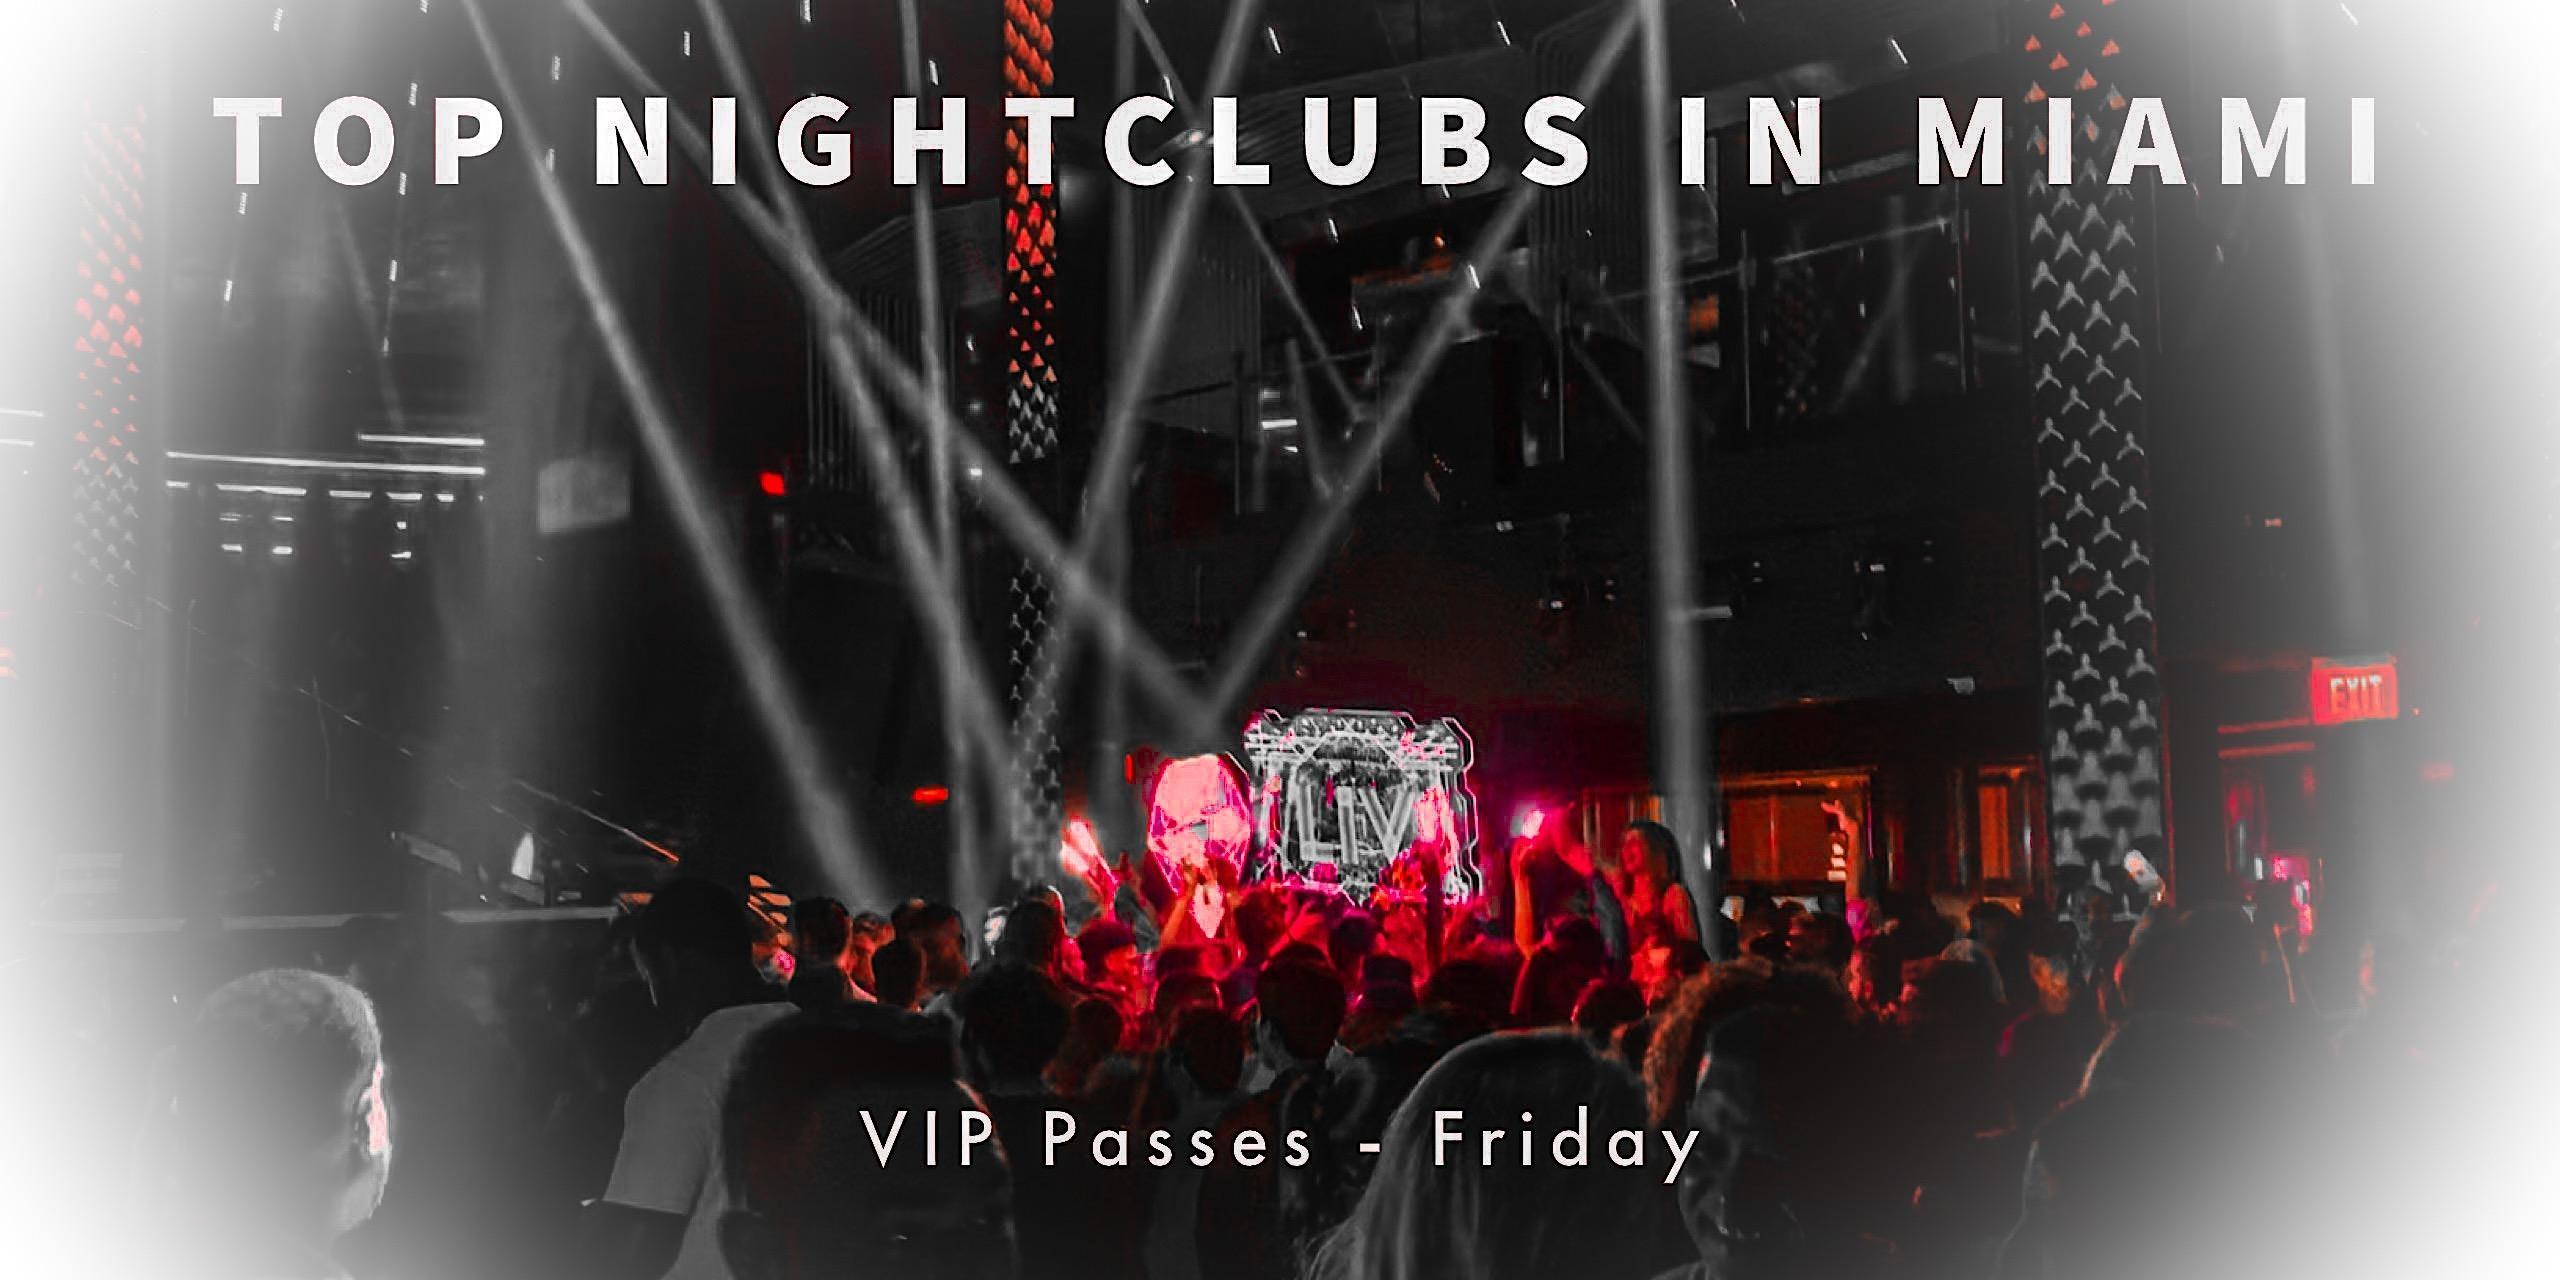 Miami Beach Nightclub VIP Party Ticket